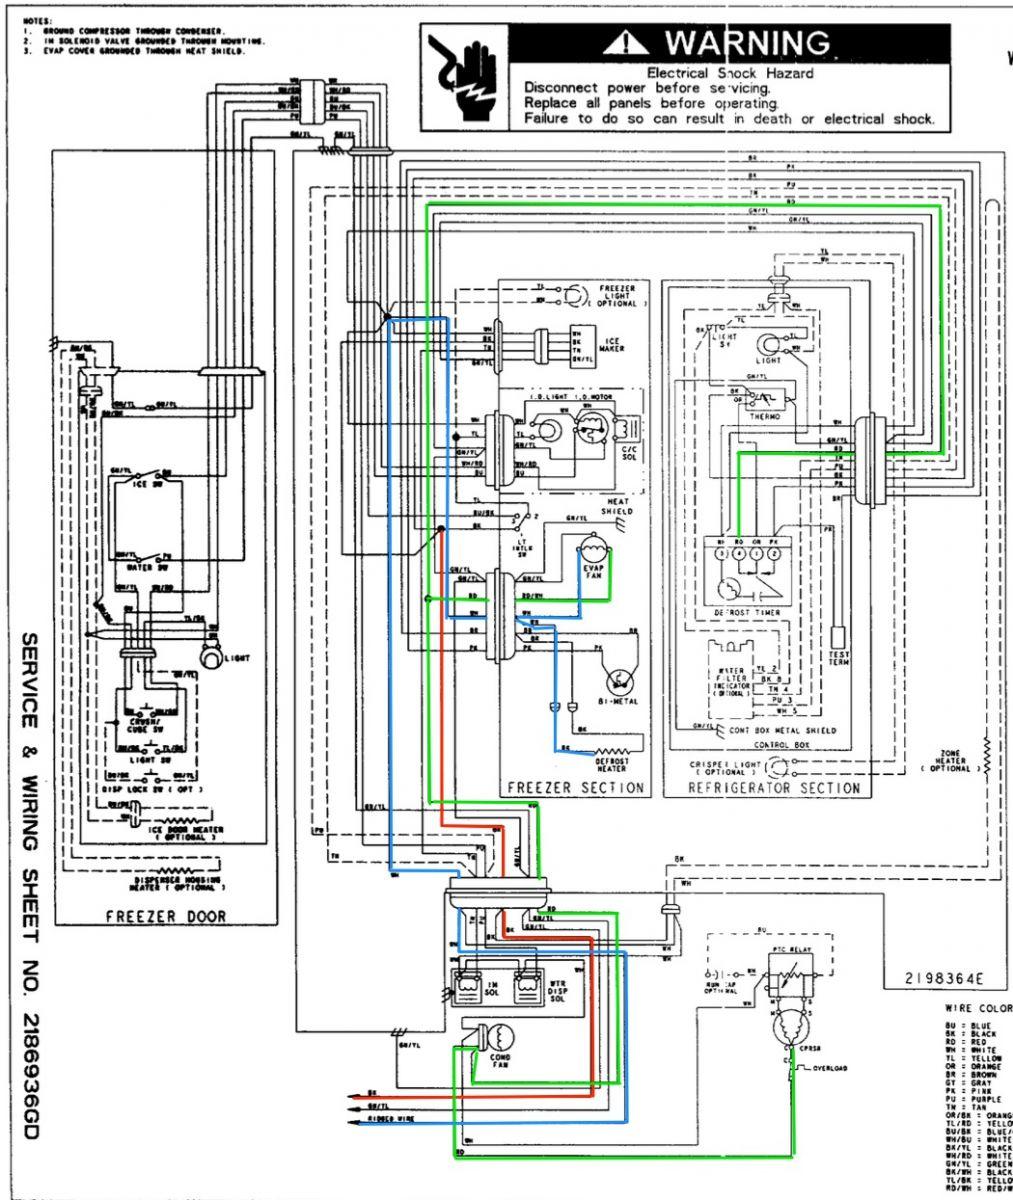 Whirlpool Ed25Rfxfw01 Refrigerator Wiring Diagram - The - Refrigerator Wiring Diagram